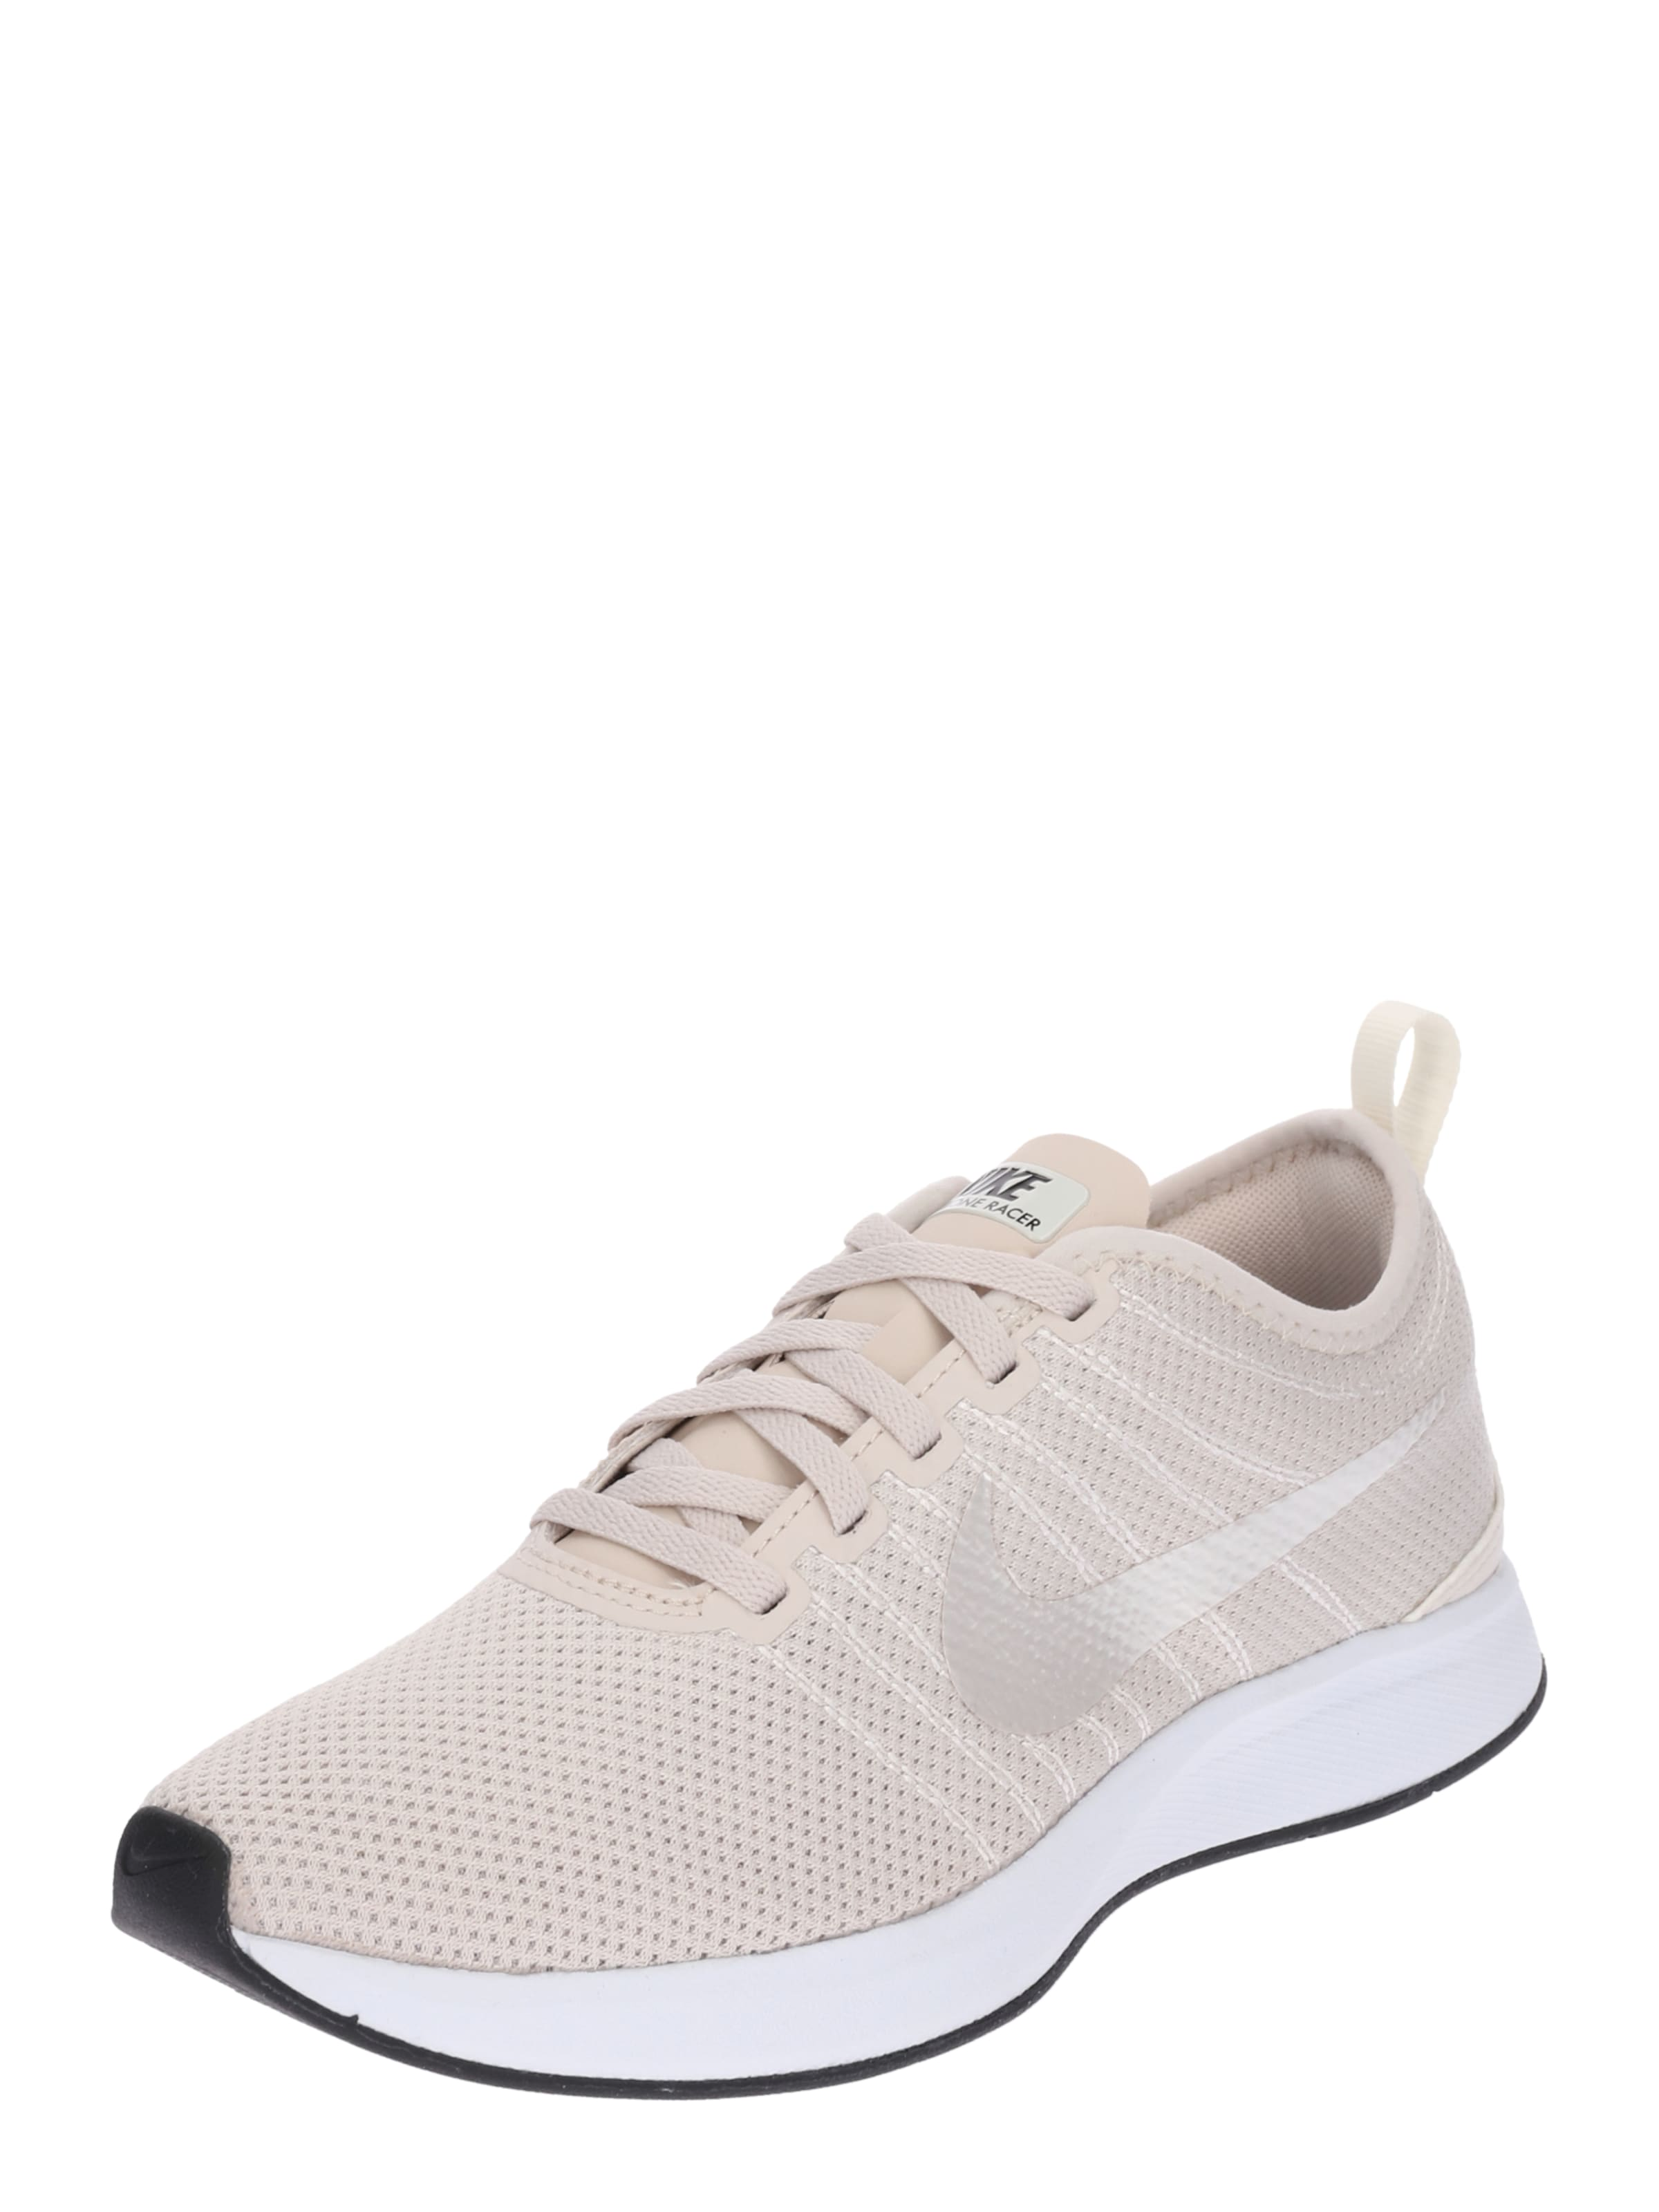 Nike Sportswear | Turnschuhe Turnschuhe | Dualtone Racer 4a2794